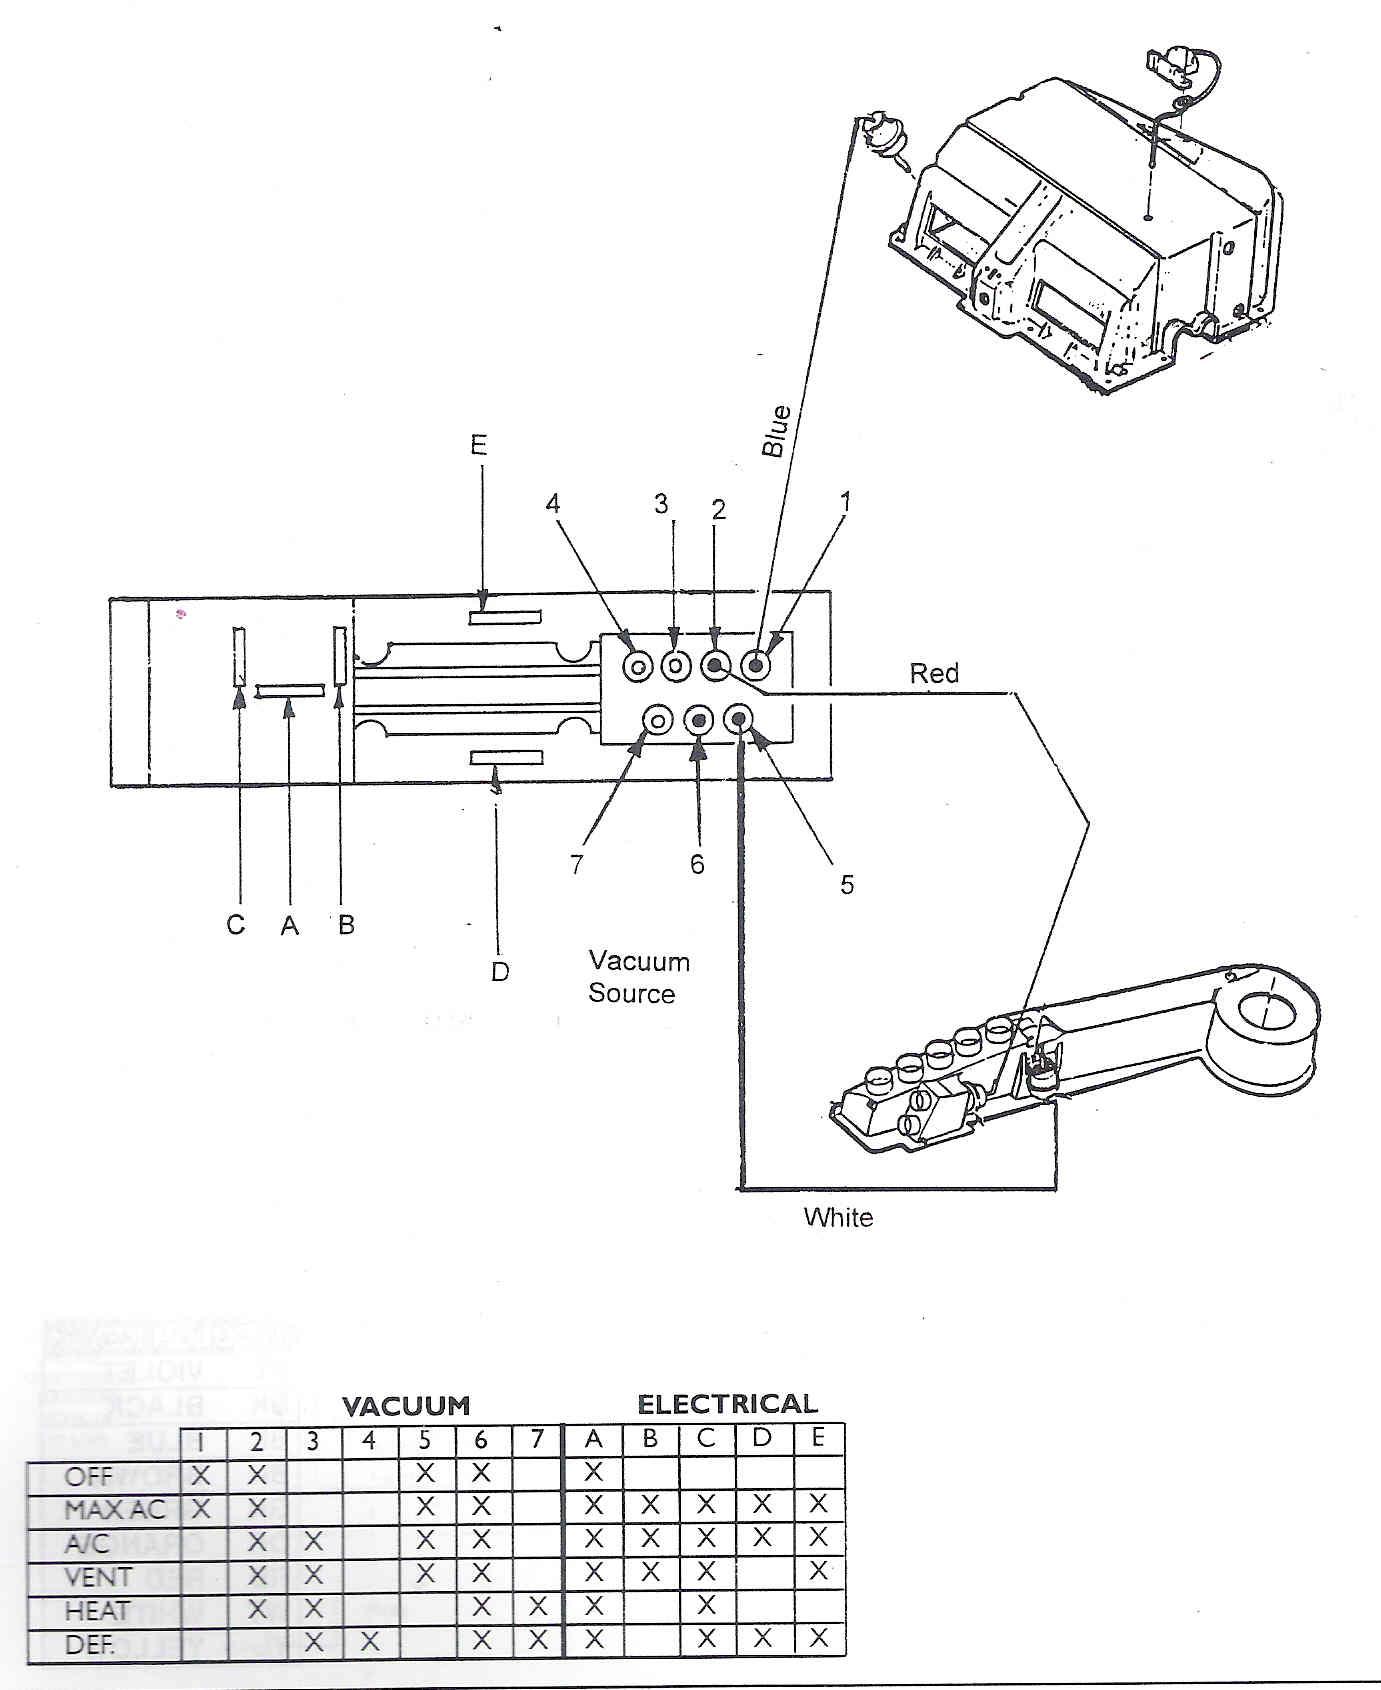 hight resolution of 98 chieftain winnebago fuse box